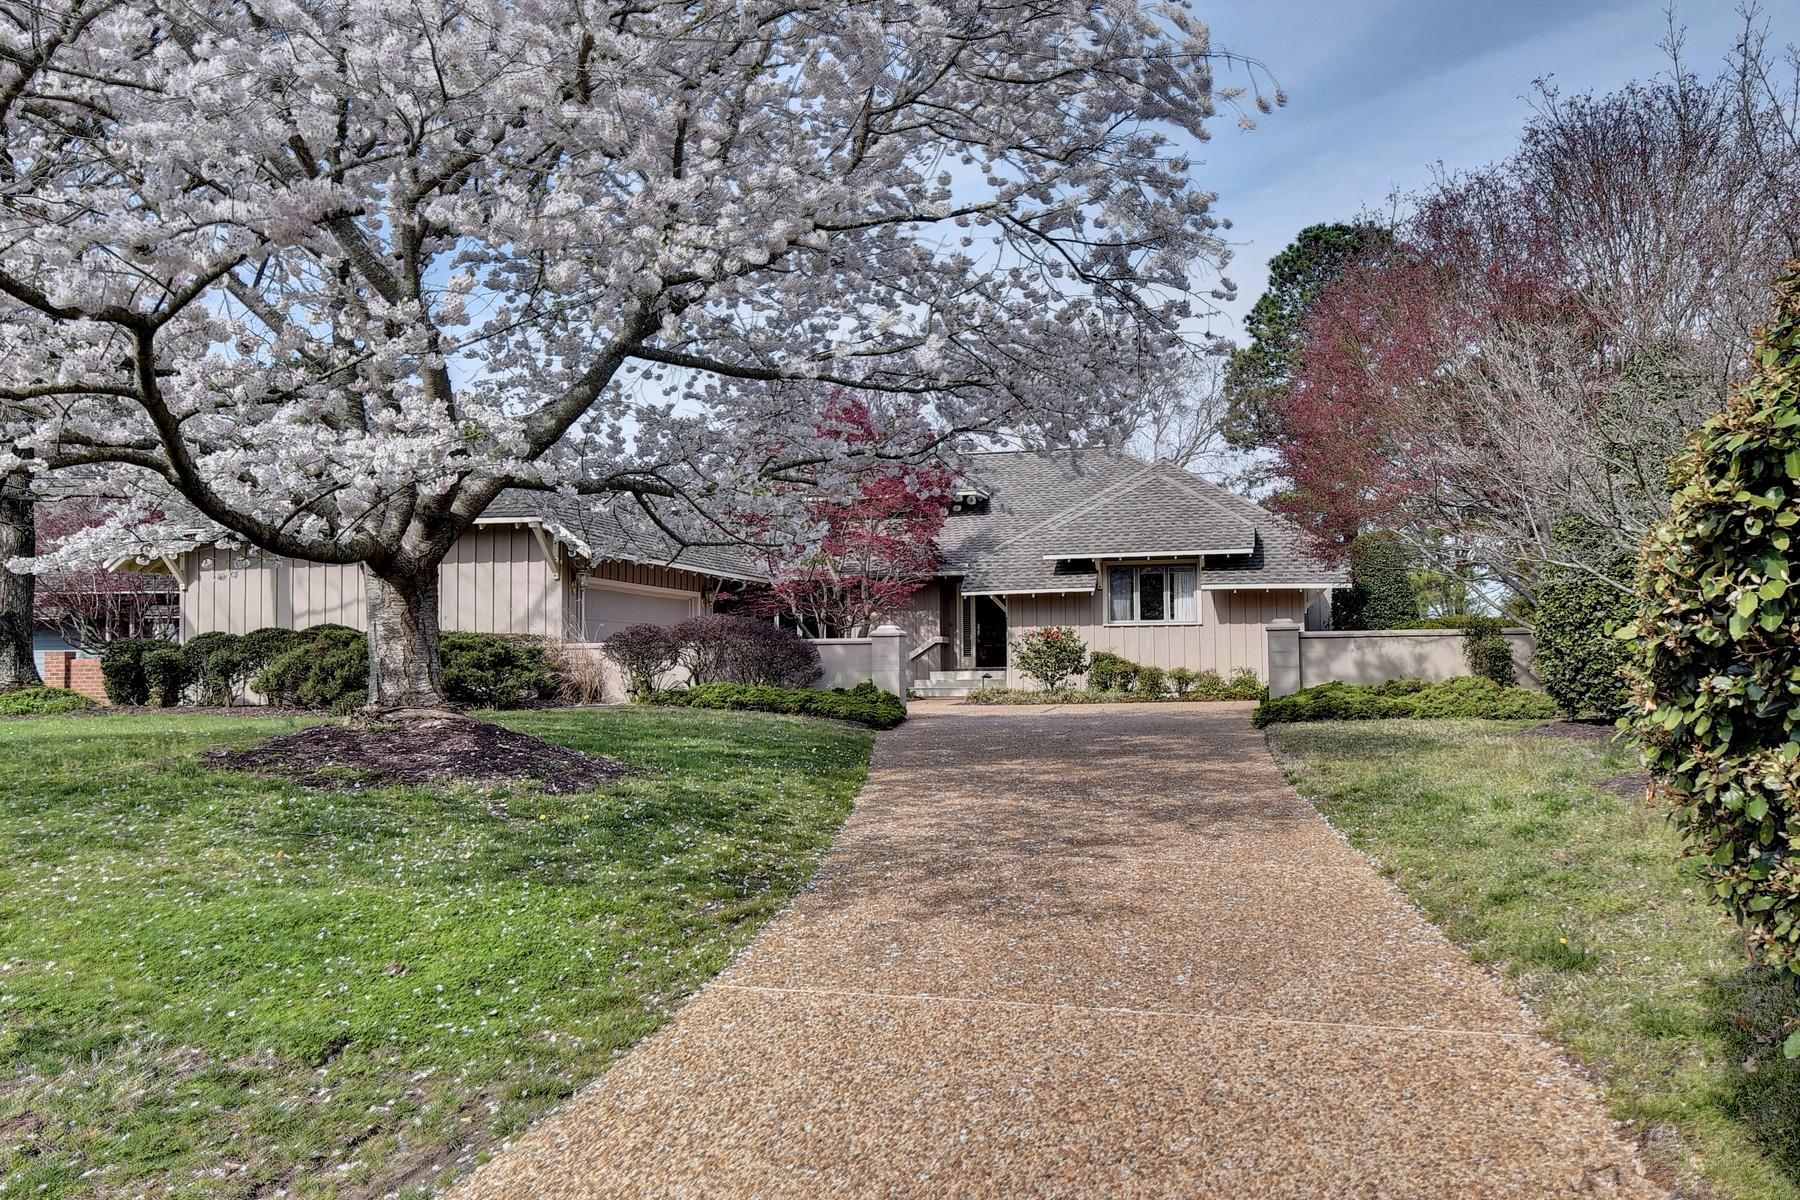 Single Family Home for Sale at 101 Bennett Circle 101 Bennett Cir Williamsburg, Virginia 23185 United States